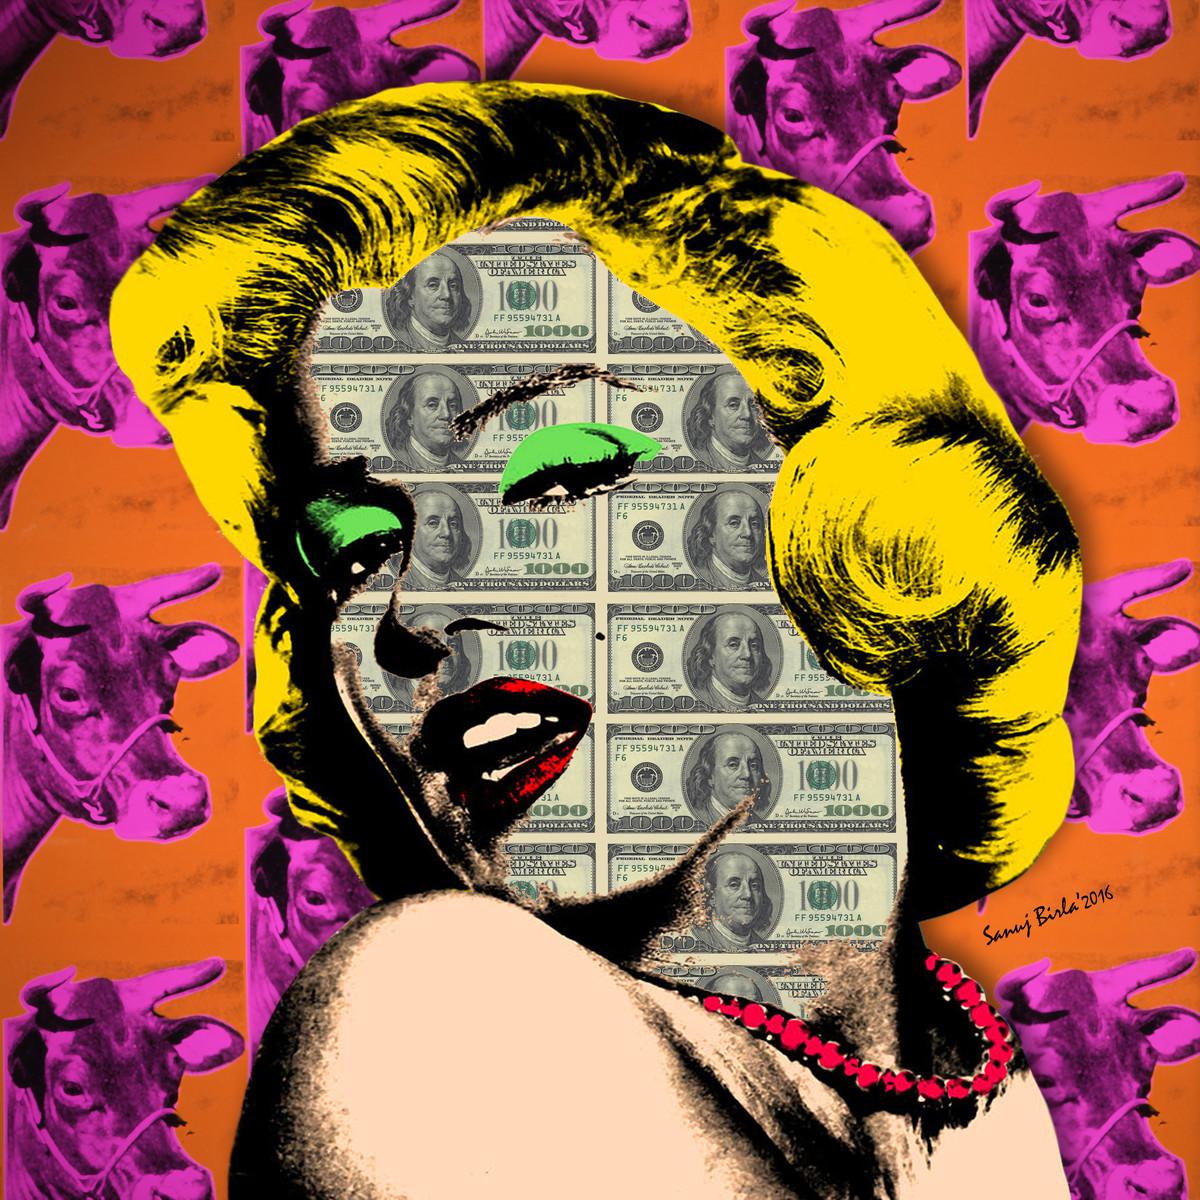 WARHOL'S MONROE by Sanuj Birla, Pop Art Digital Art, Digital Print on Canvas, Brown color